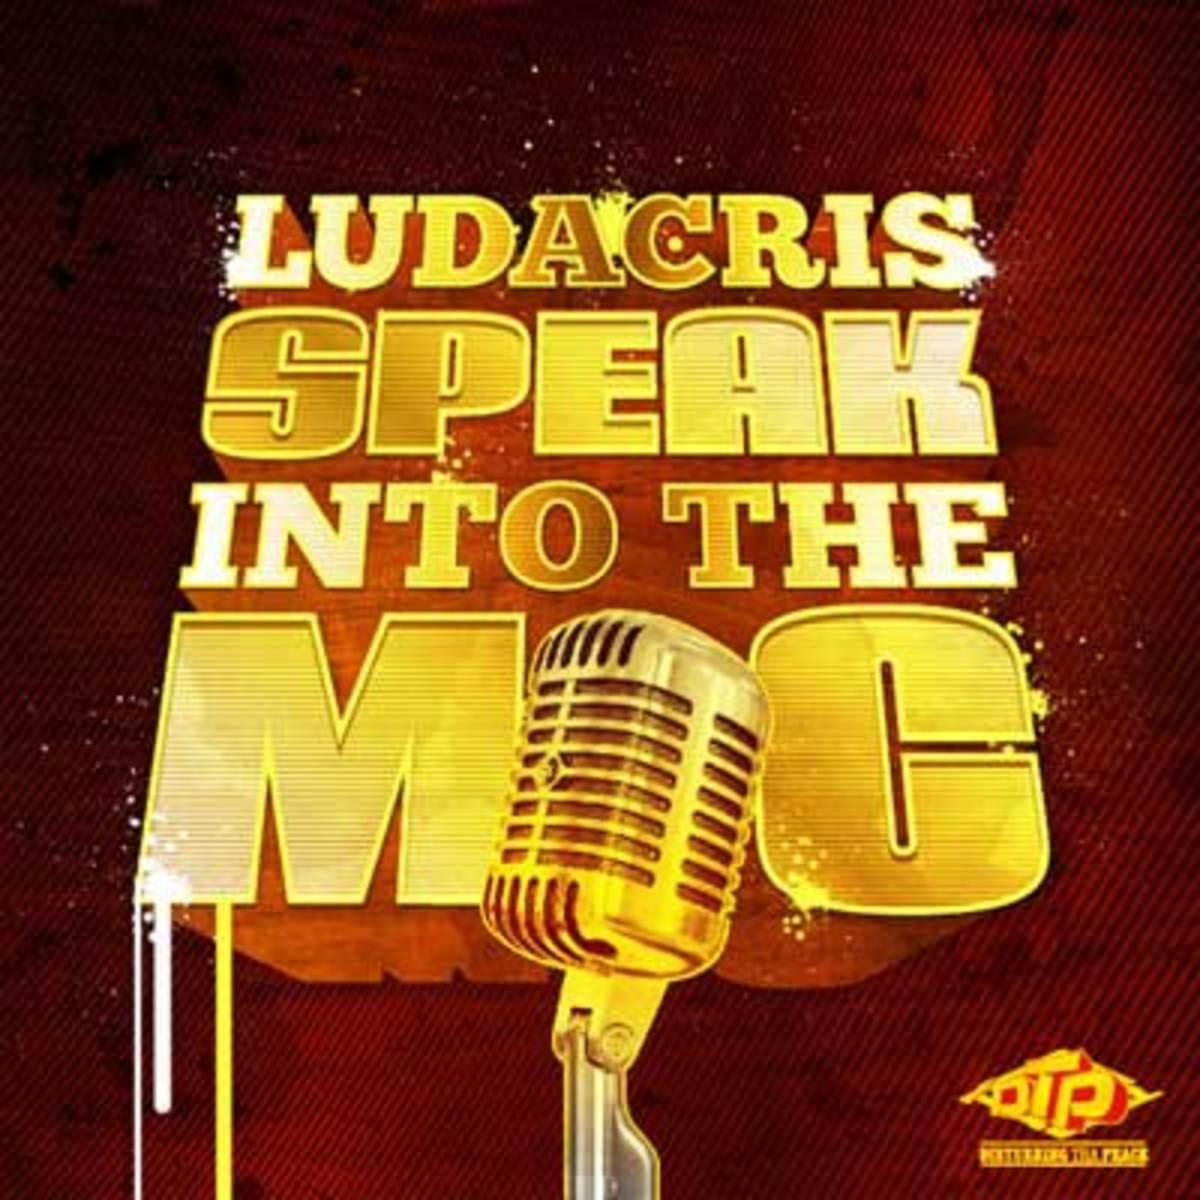 ludacris-speakintothemic.jpg